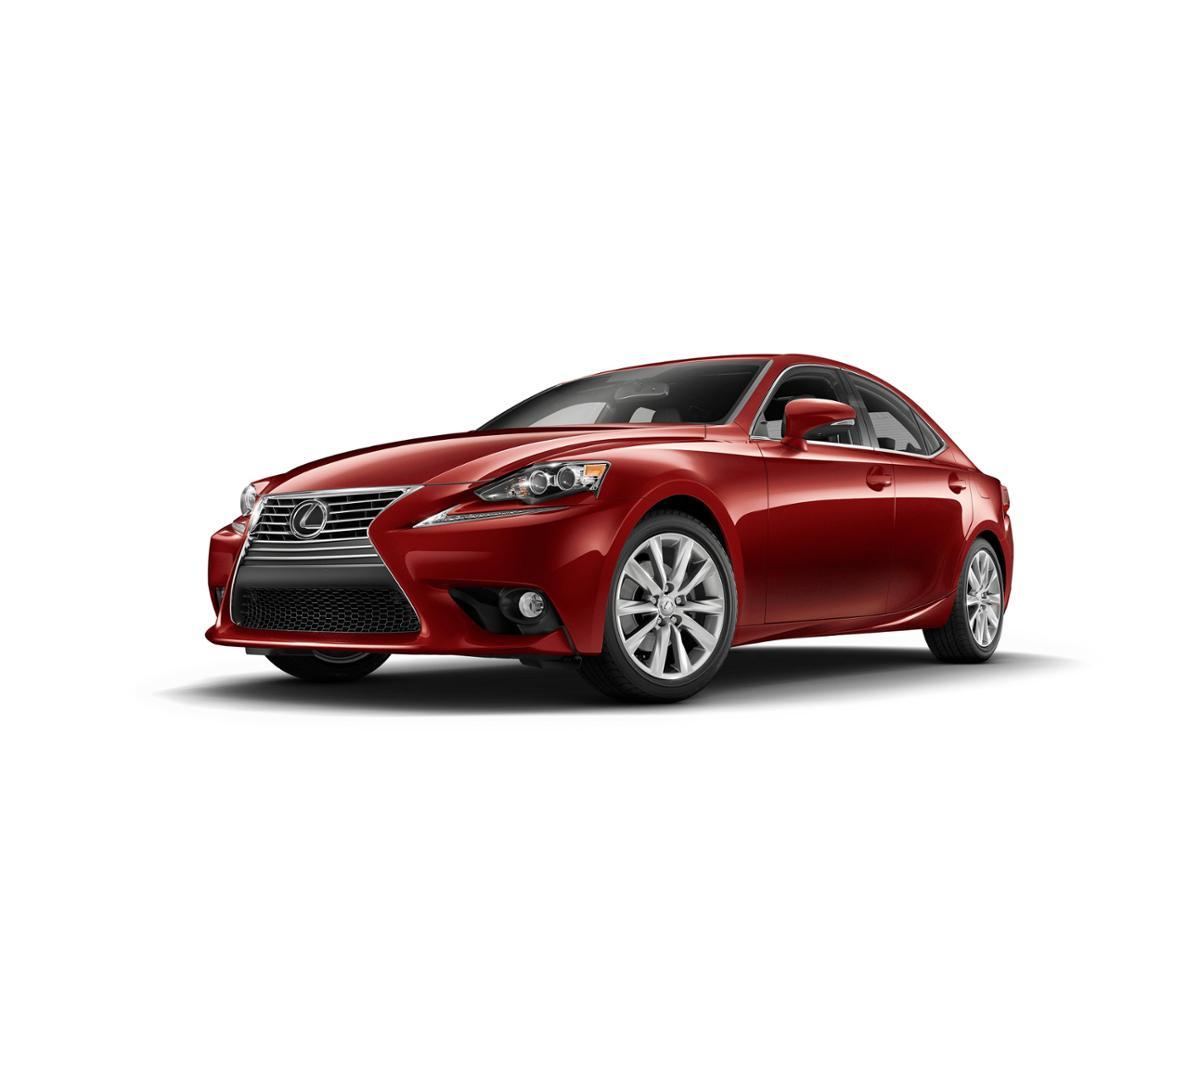 Lexus Extended Warranty: Escondido Redline 2016 Lexus IS Turbo: New Car For Sale -E8060